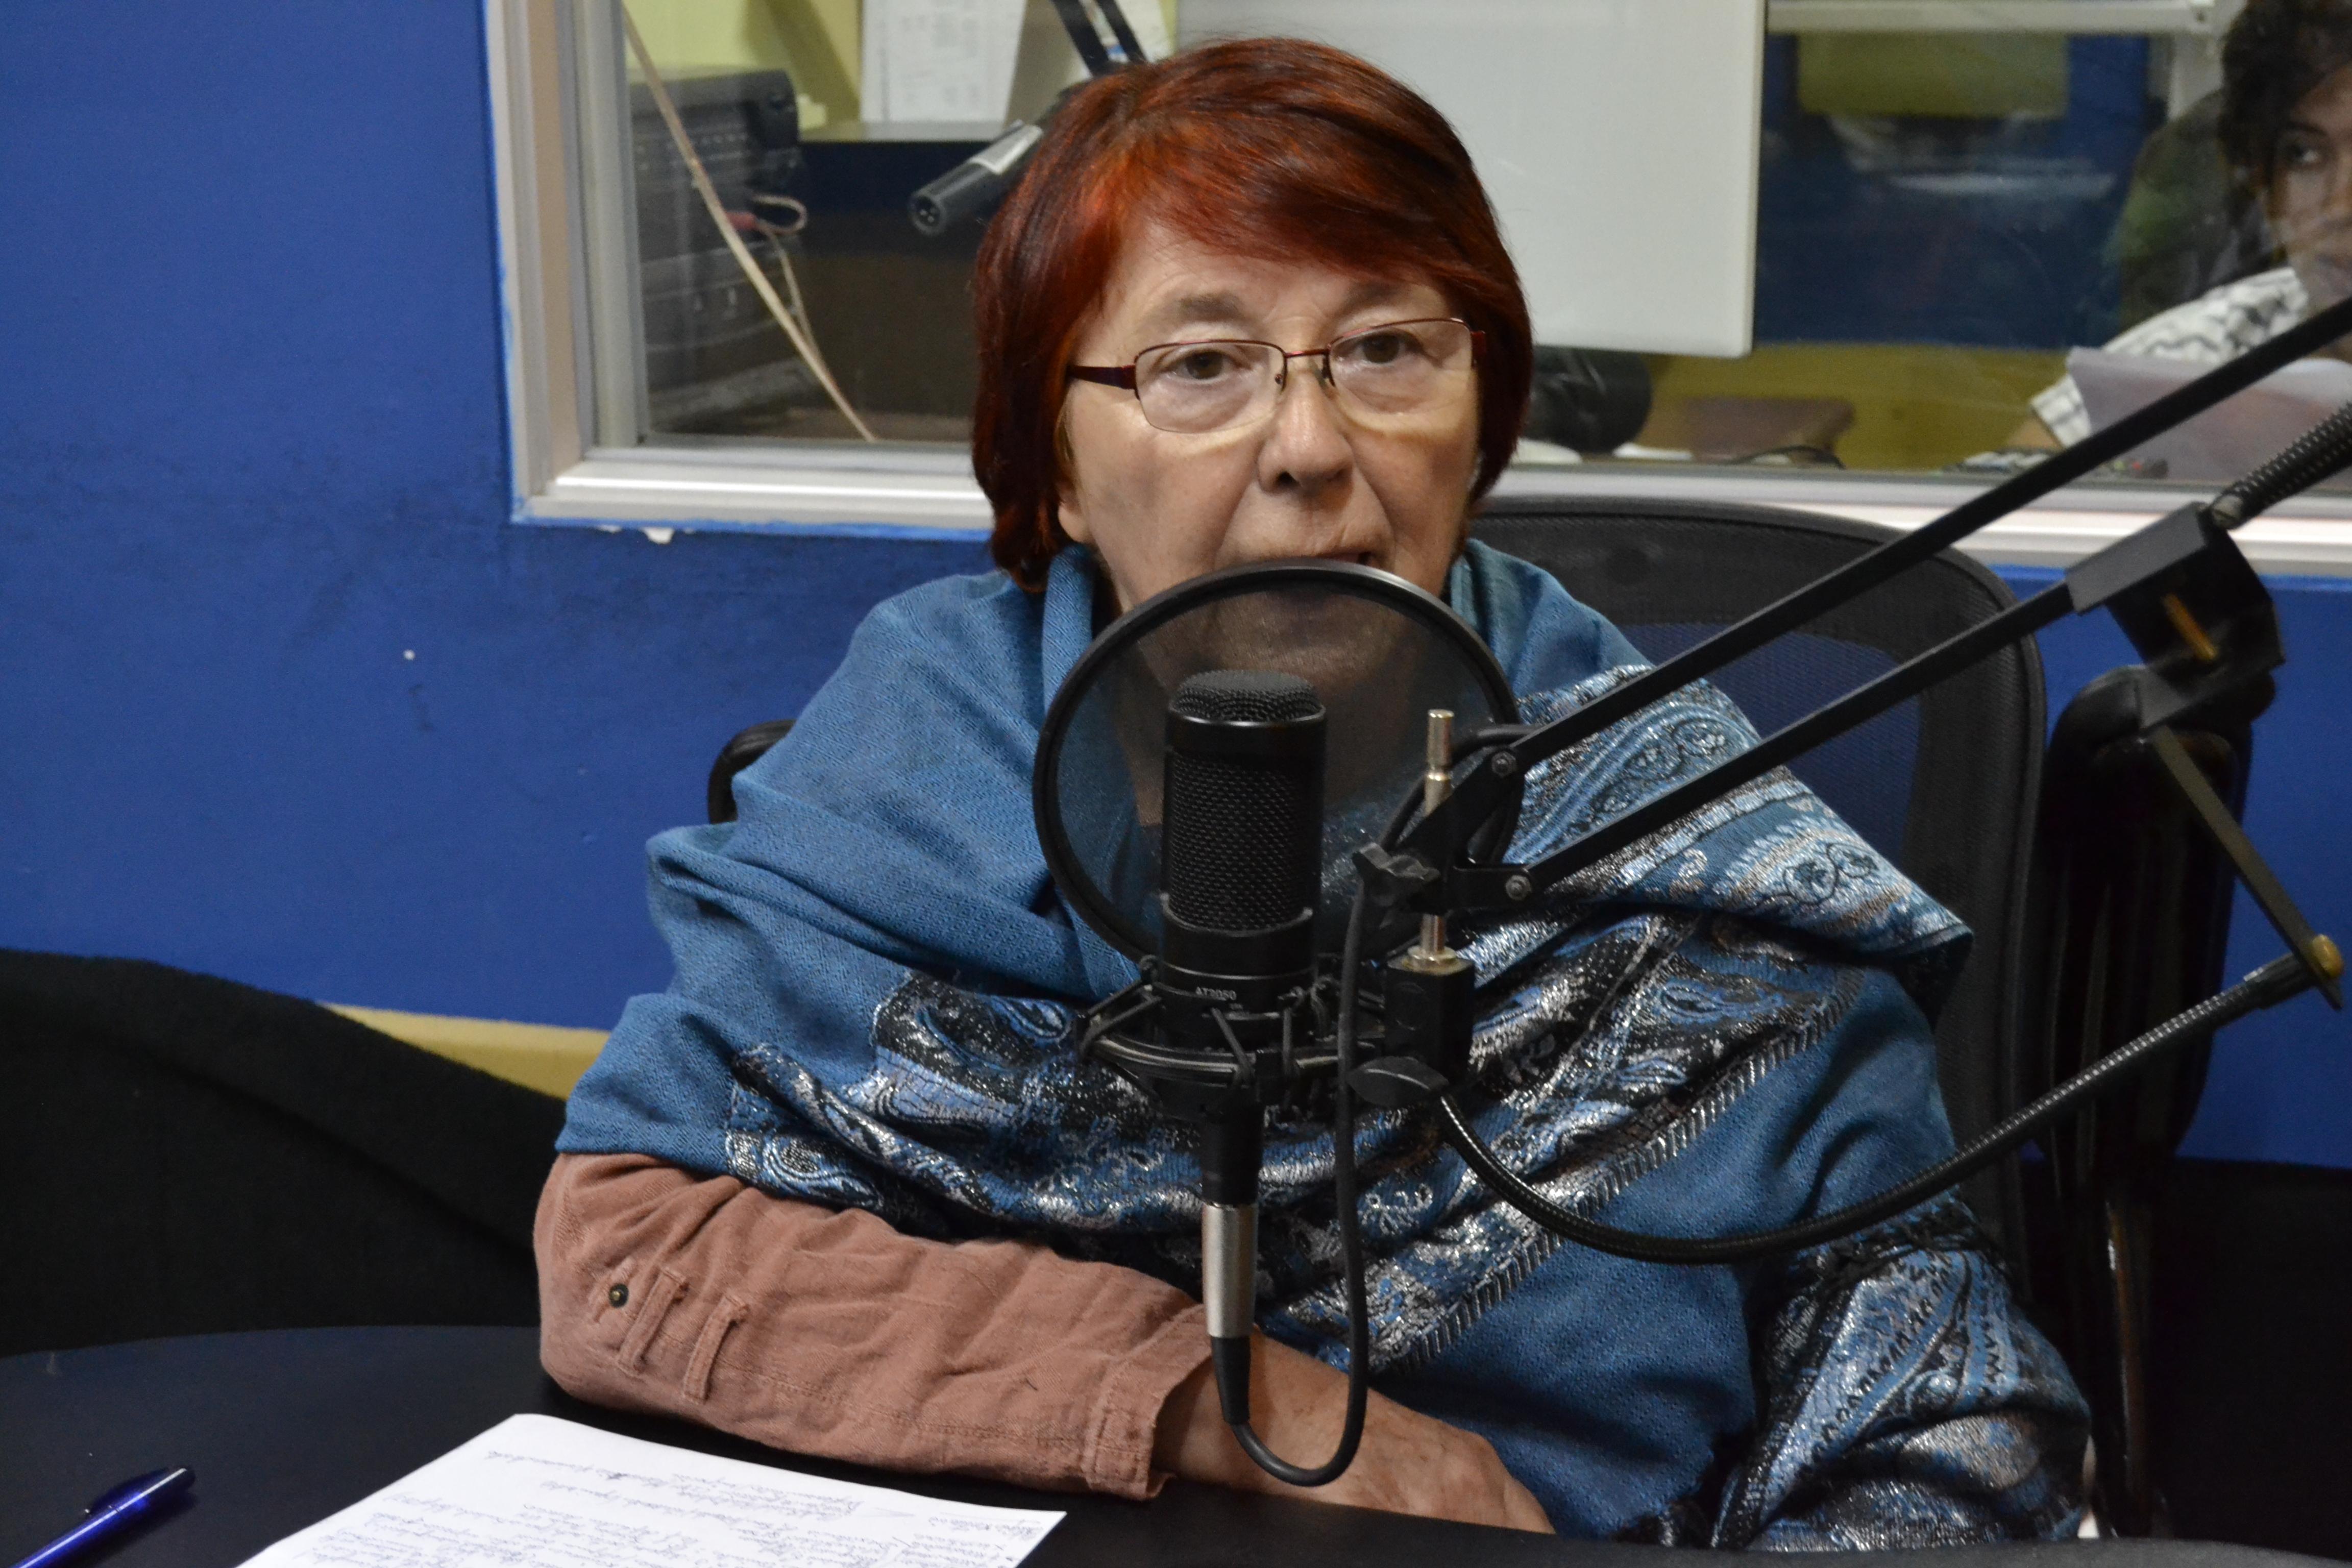 Clara Murguialday